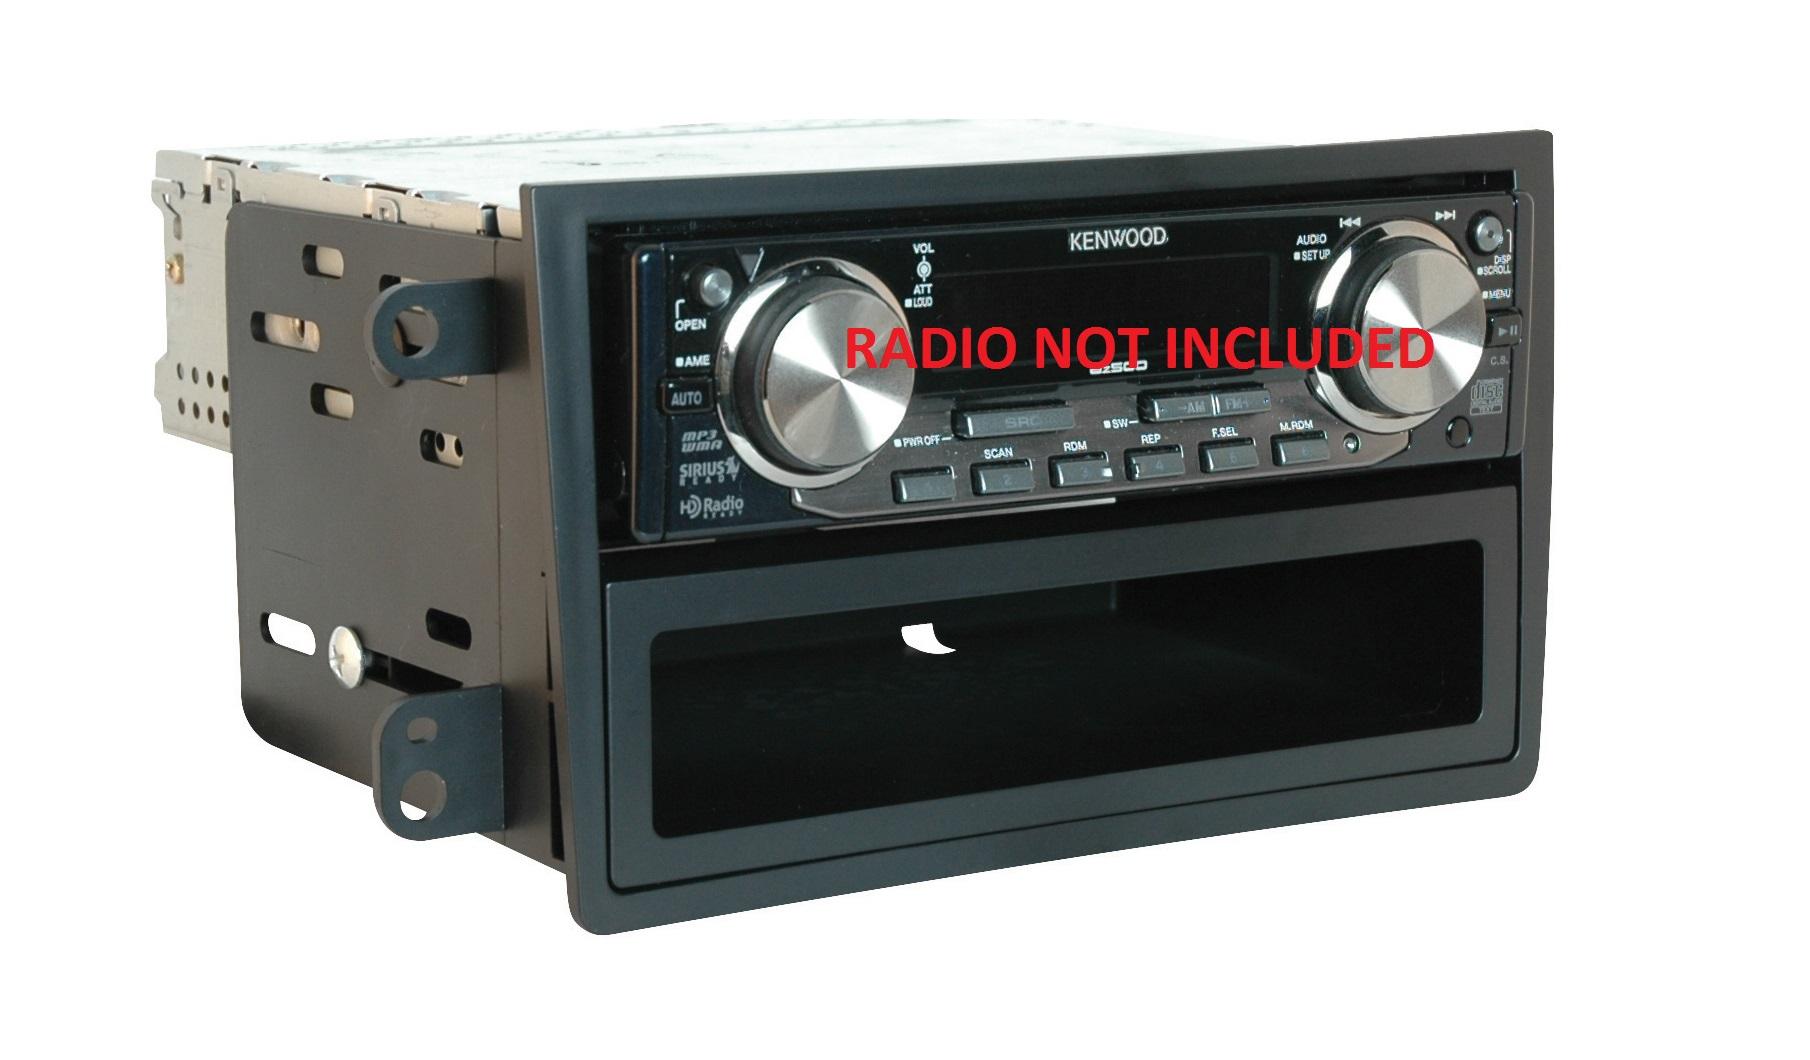 Car Stereo Bluetooth: Kenwood Car Stereo Bluetooth Media Player Dash Install